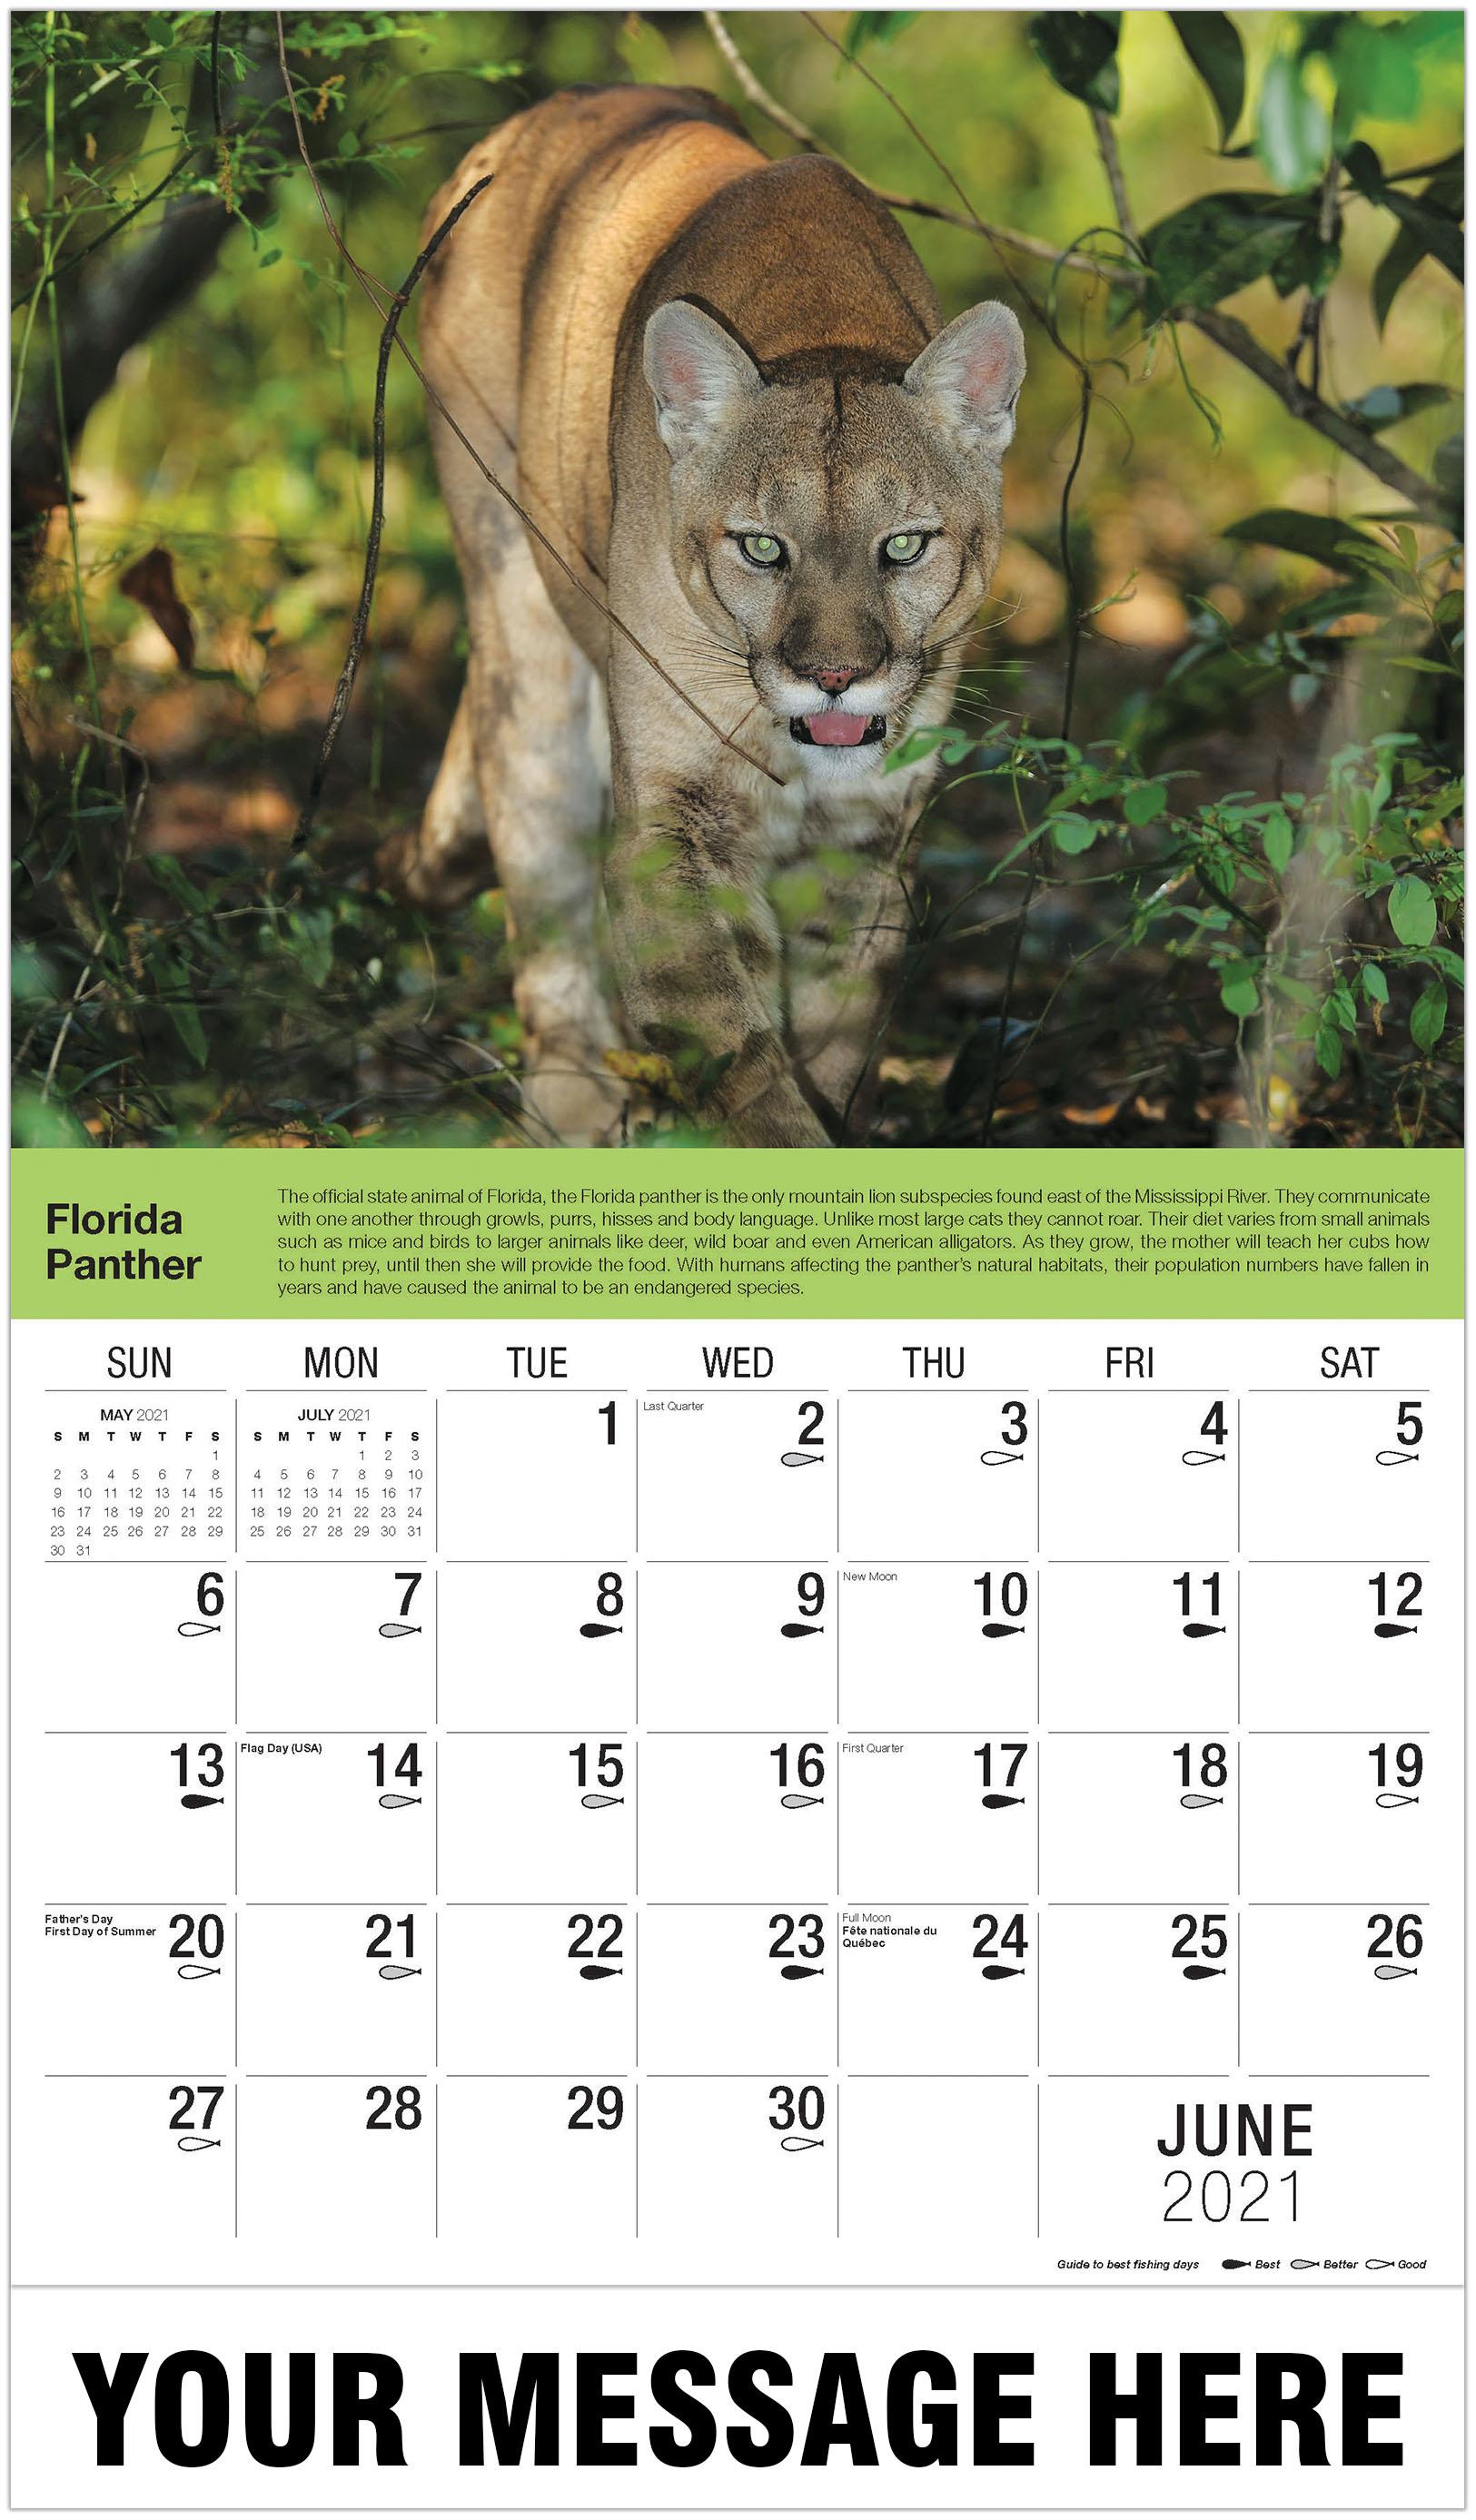 Florida Panther - June - North American Wildlife 2021 Promotional Calendar